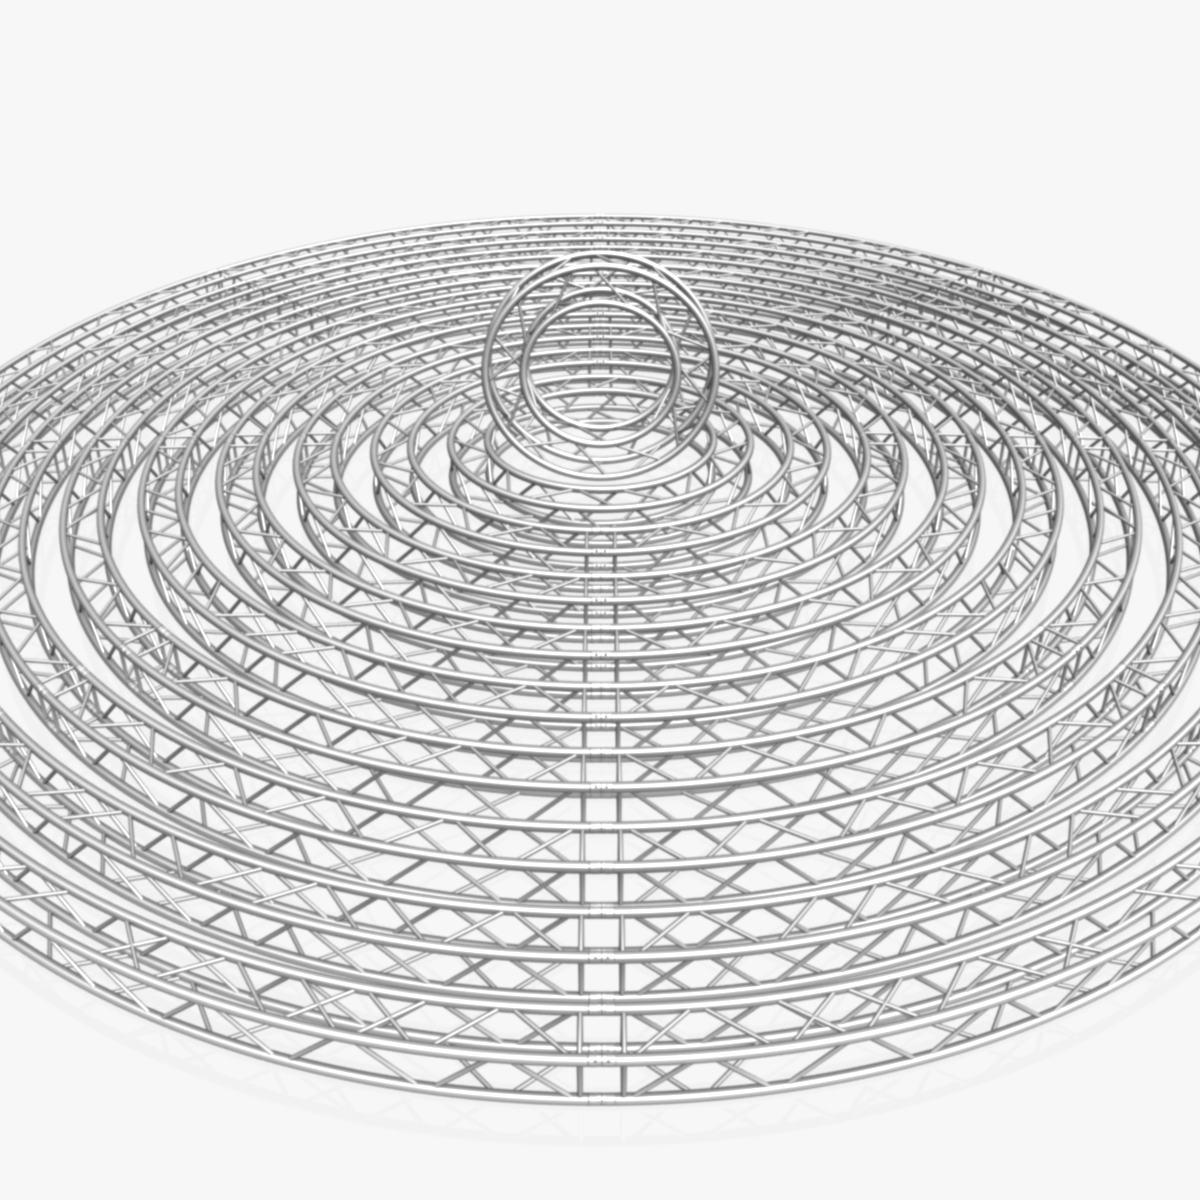 circle square truss modular collection 3d model 3ds max dxf fbx c4d dae  texture obj 252329